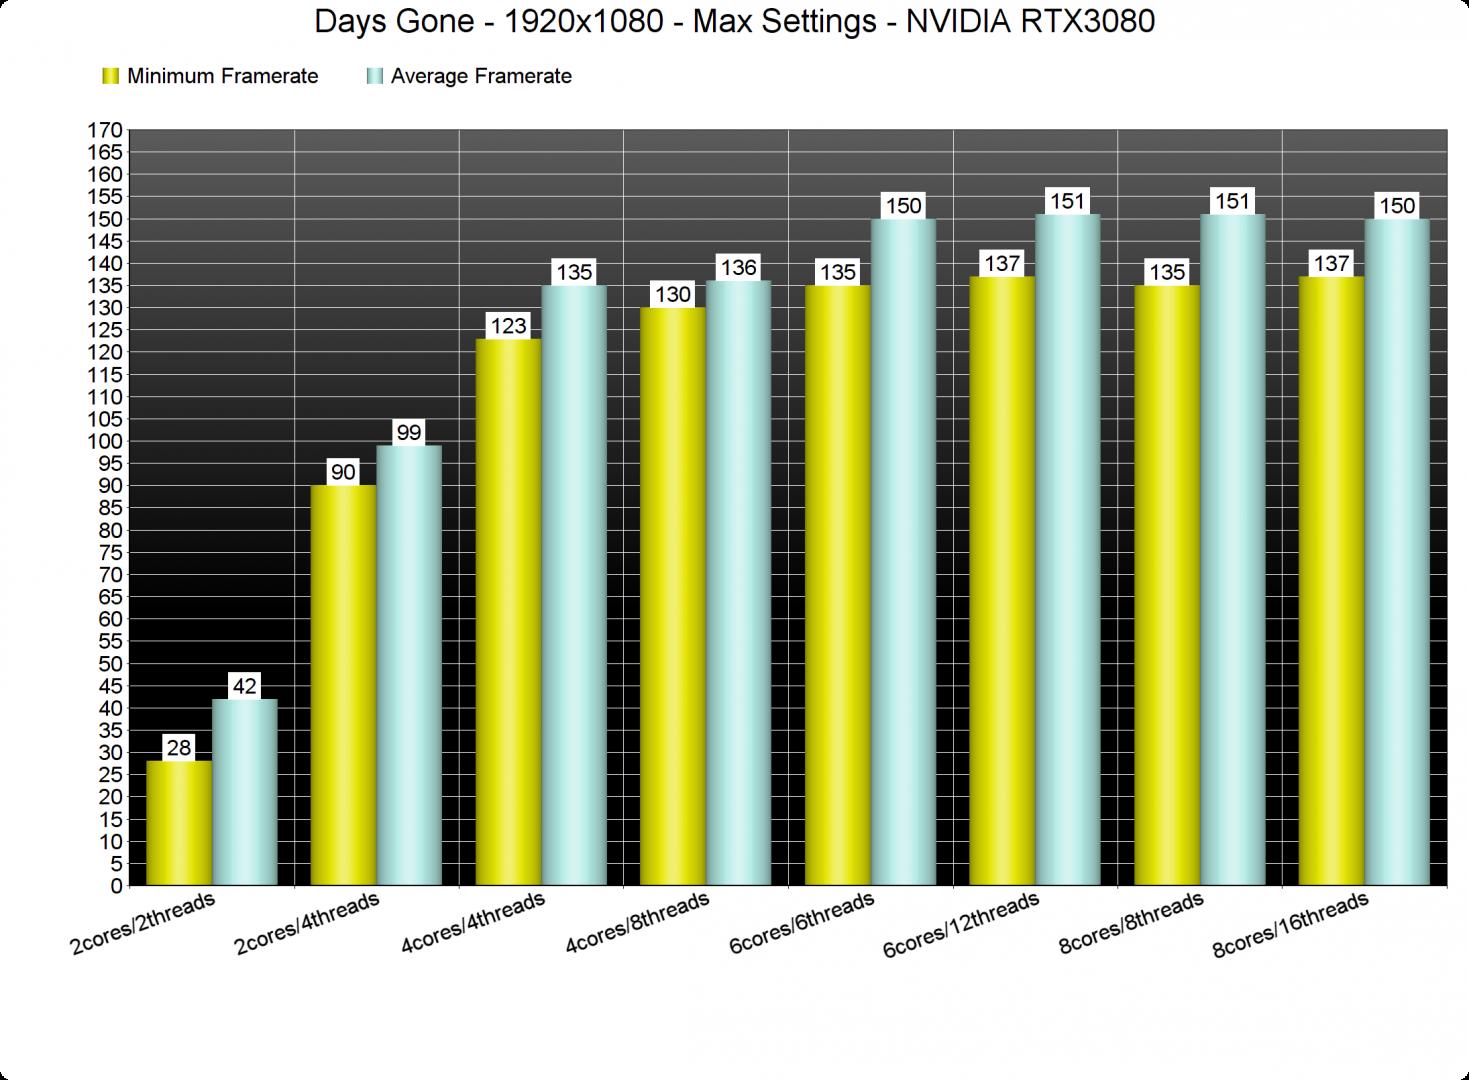 Days Gone CPU benchmarks